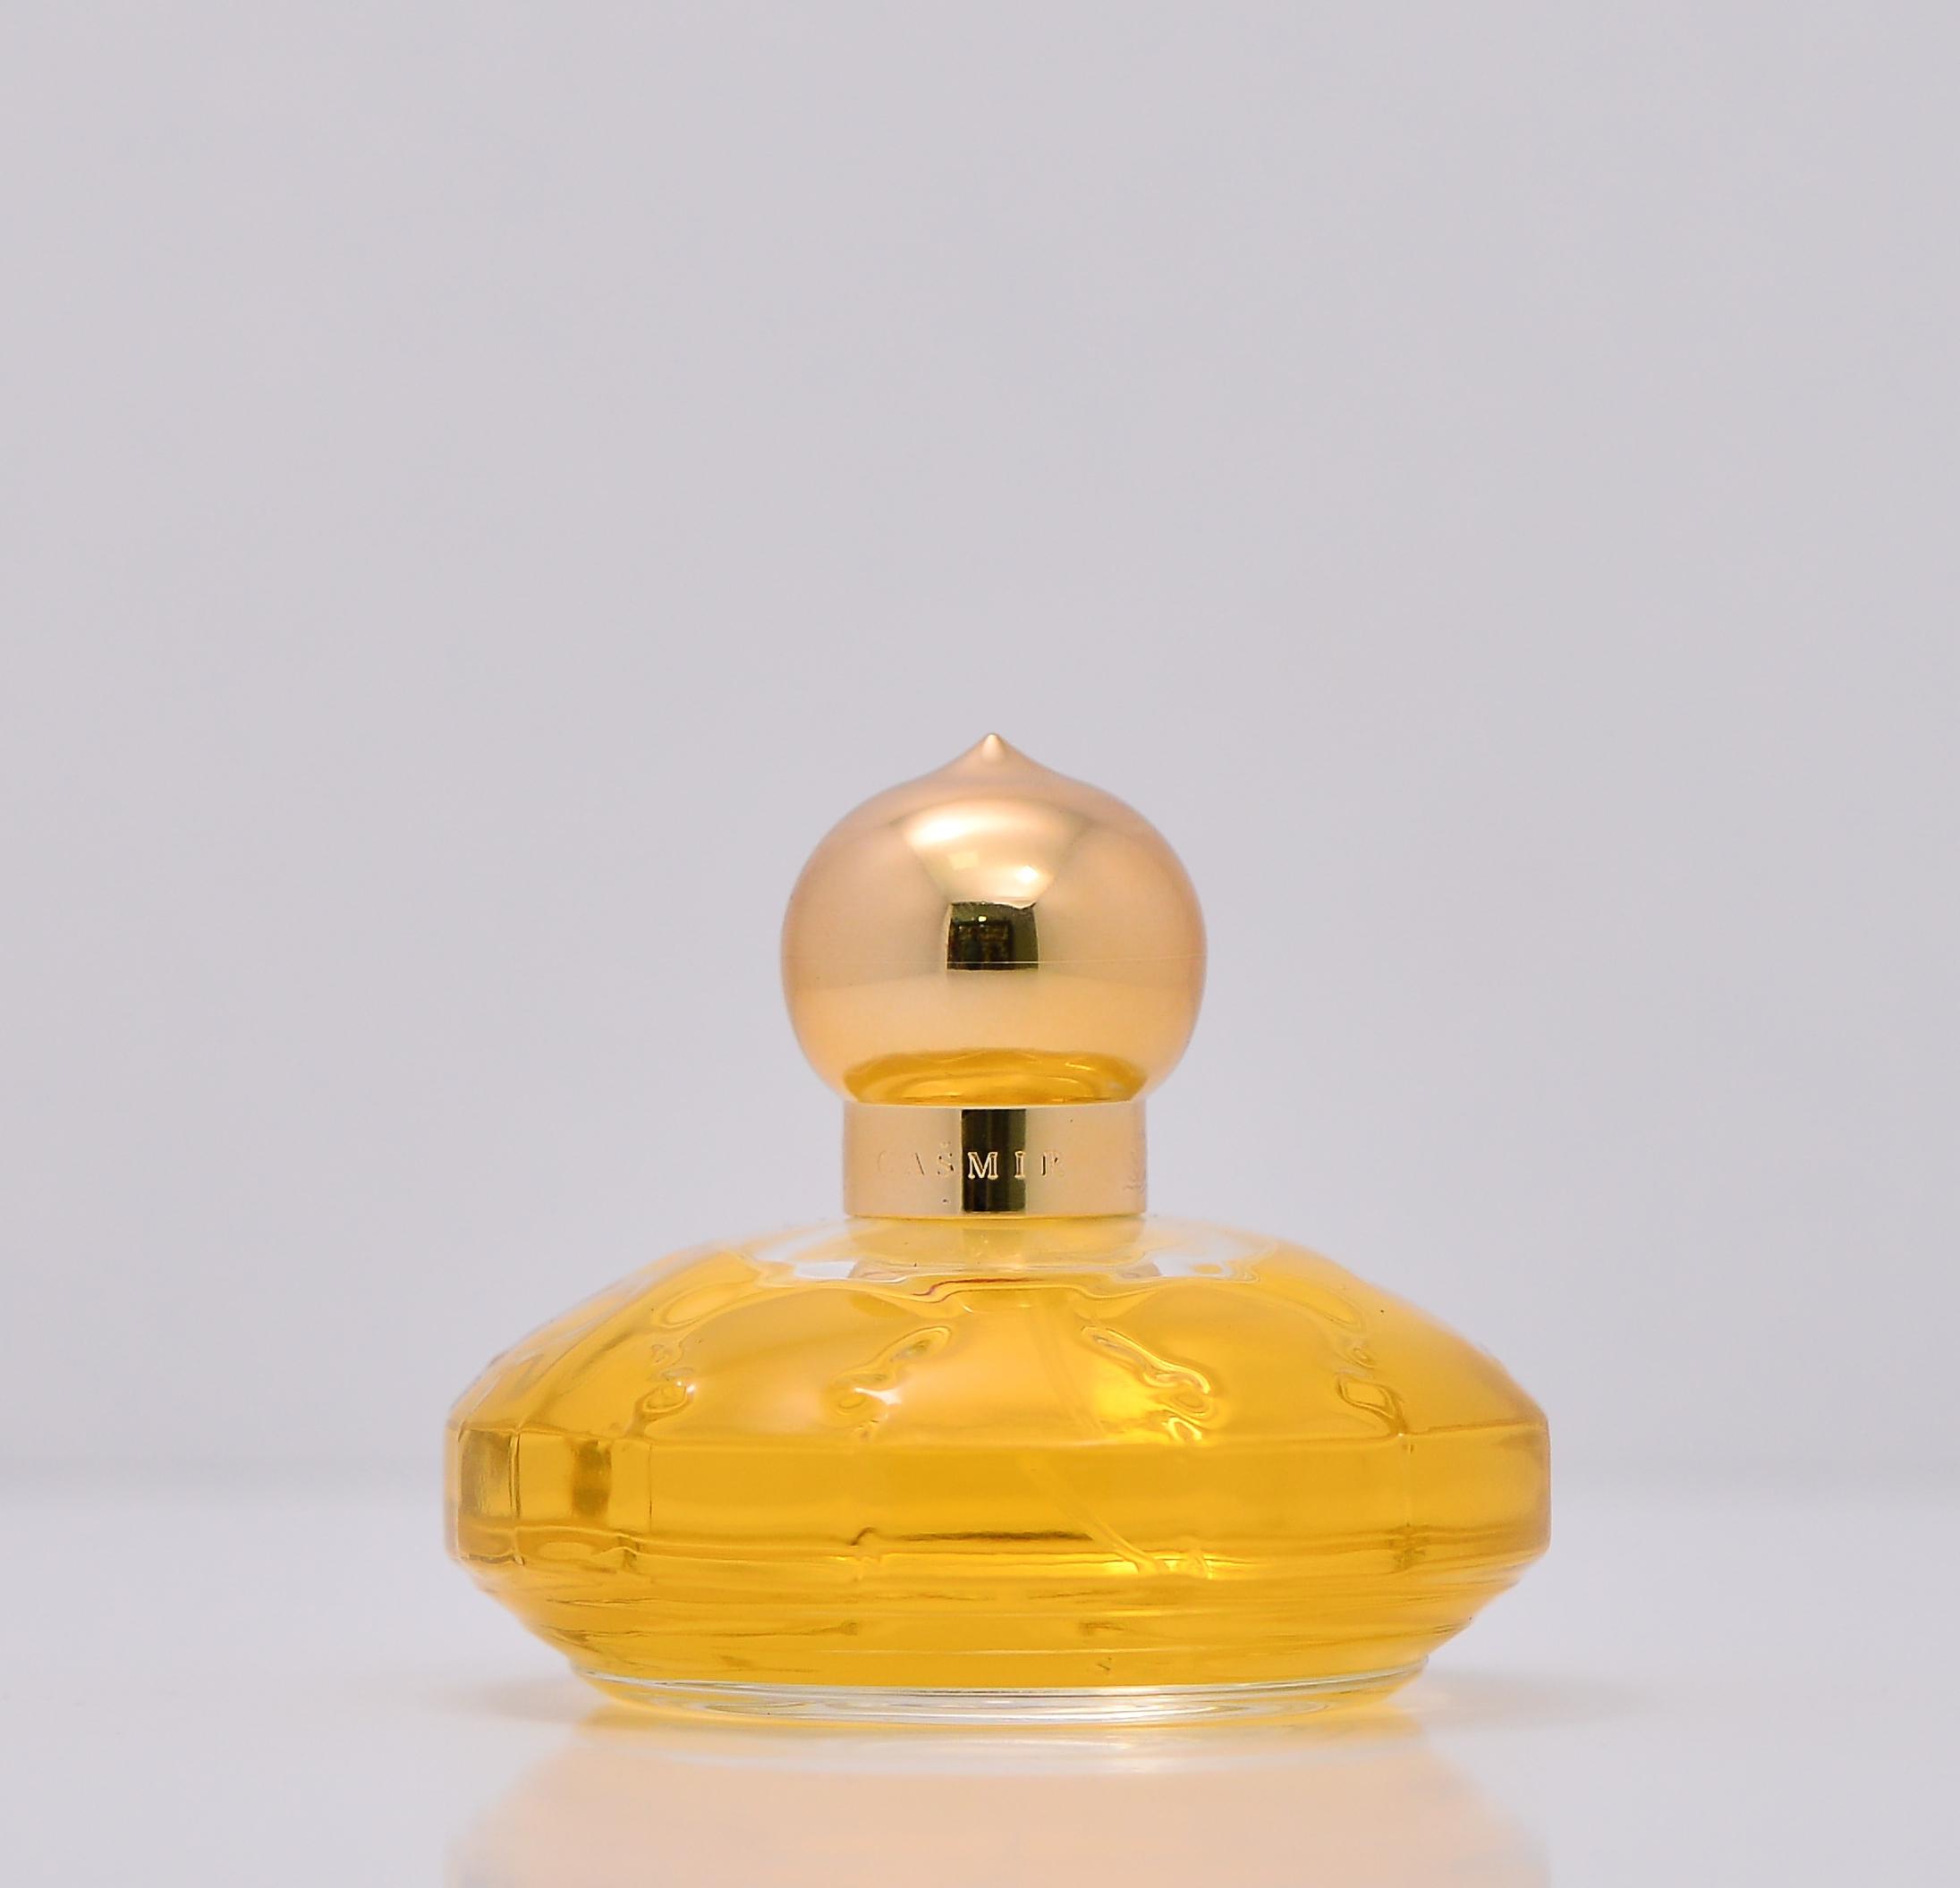 Parfum Chopard Casmir 100 Ml Apa De Parfum Ollero